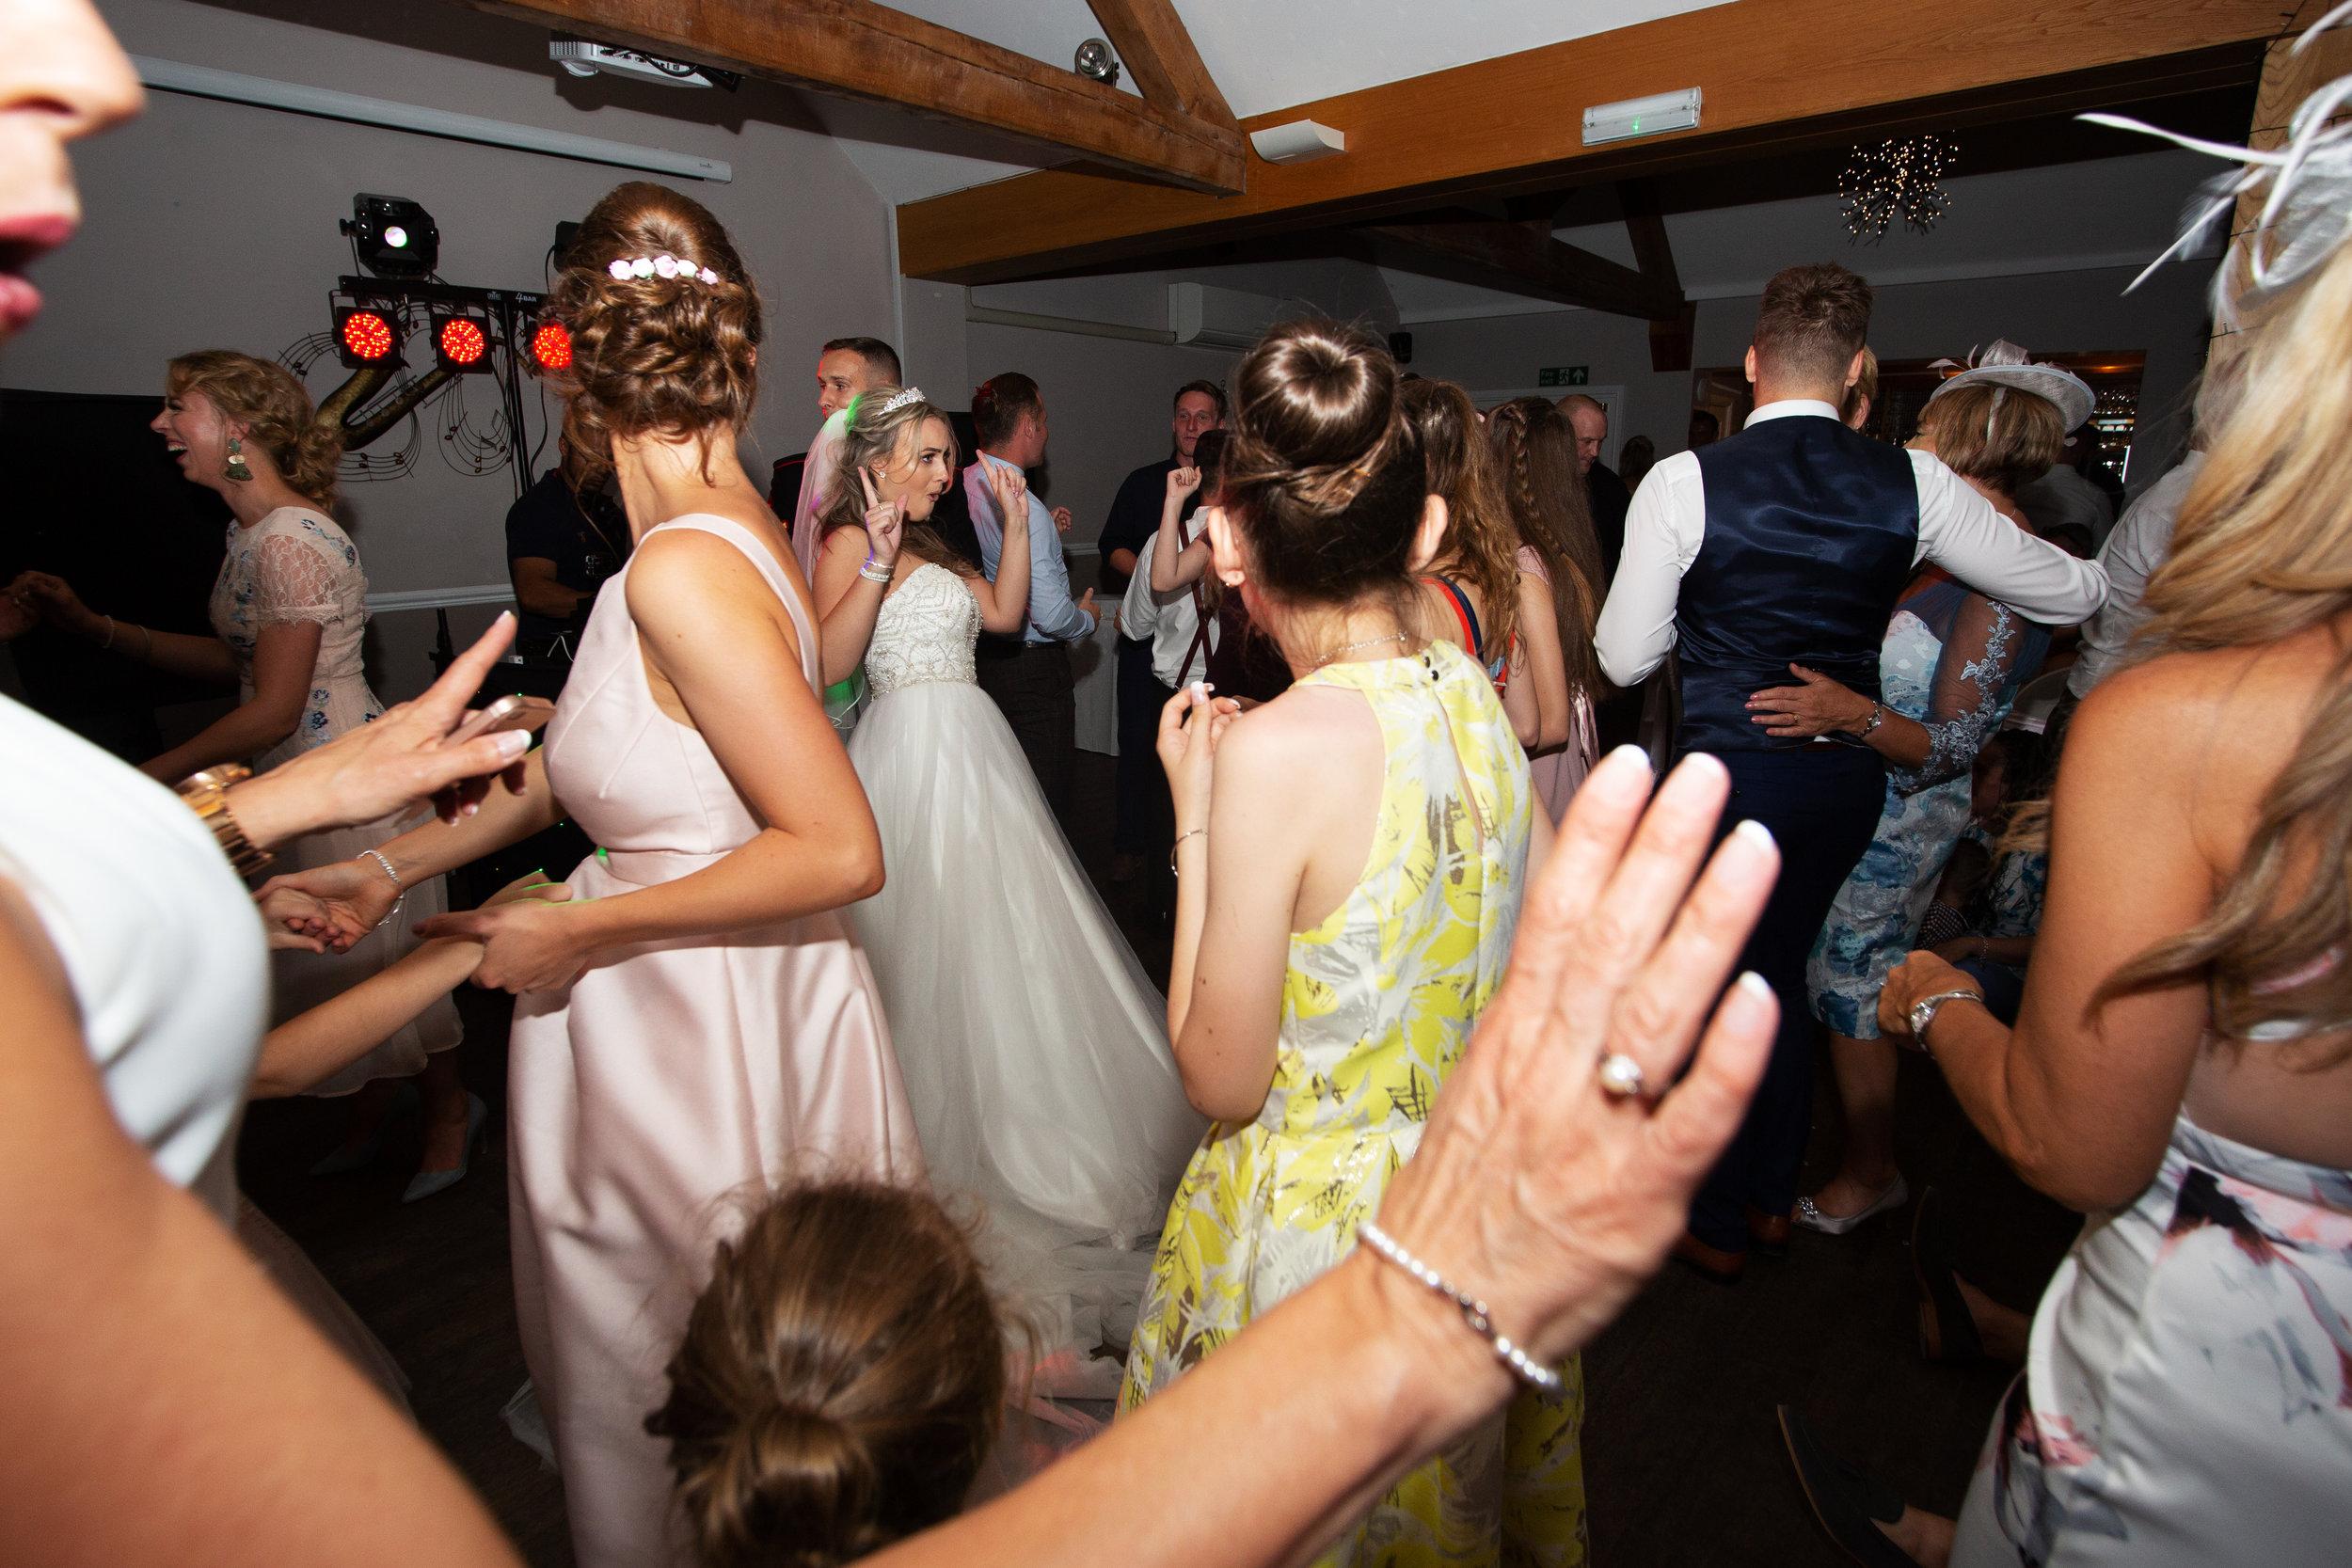 wedding-lea-cooper-photography-willenhall-west-midlands-wolverhampton-dudley-birmingham-uk-marriage-hadley-park-east-telford-bride-dance.jpg